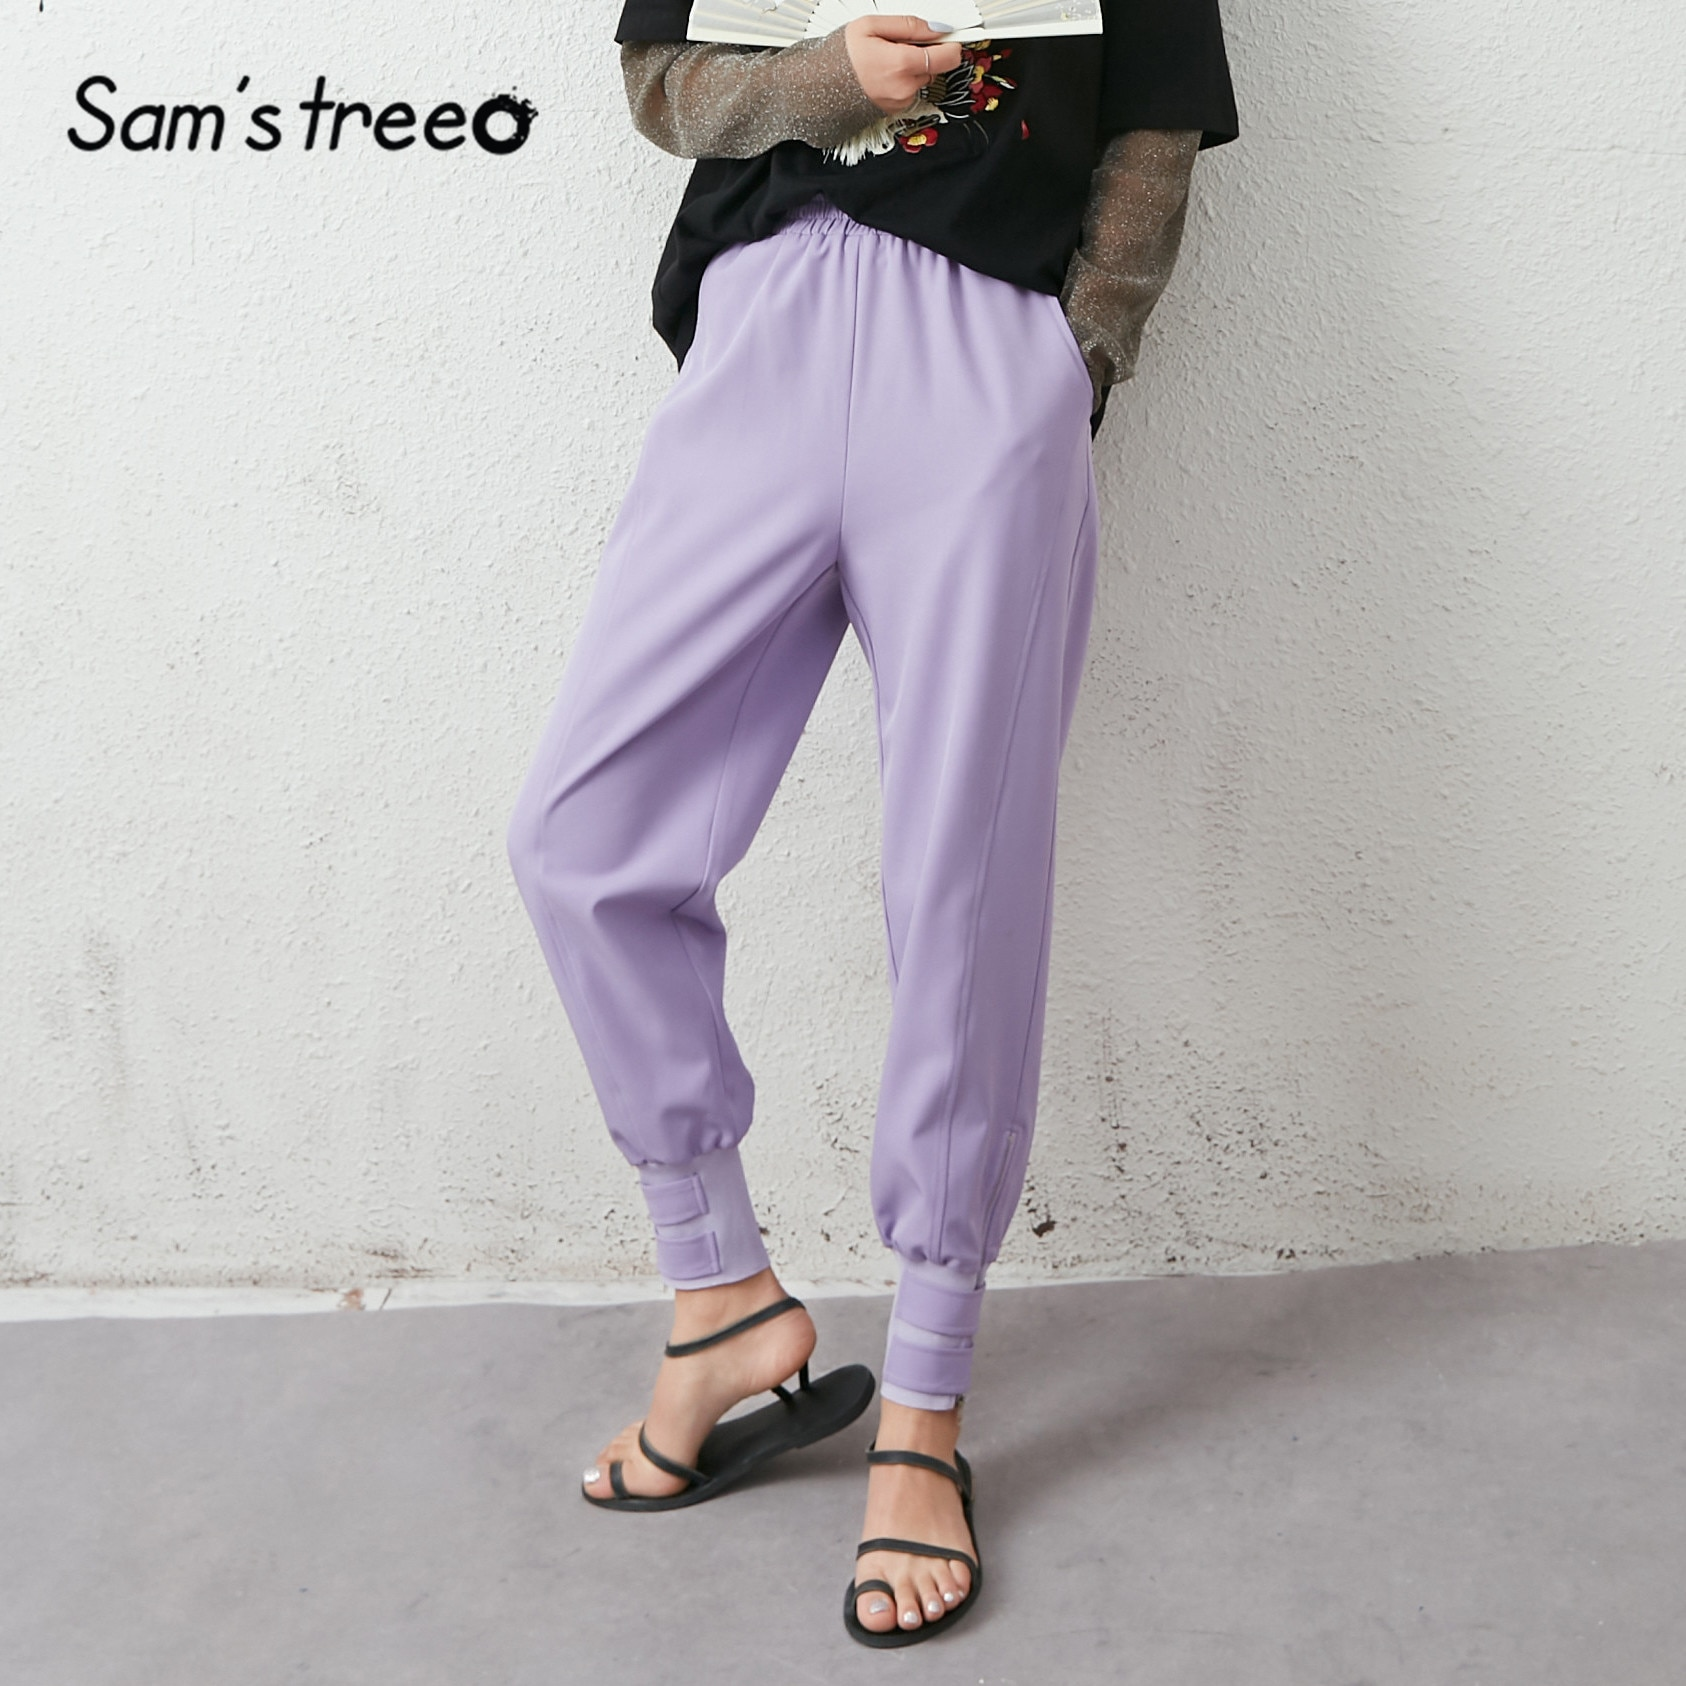 SAMS TREE negro sólido alto cintura Casual mujeres pantalones 2020 verano lavanda púrpura encaje puro Up coreano señoras Safari diario Pantalones